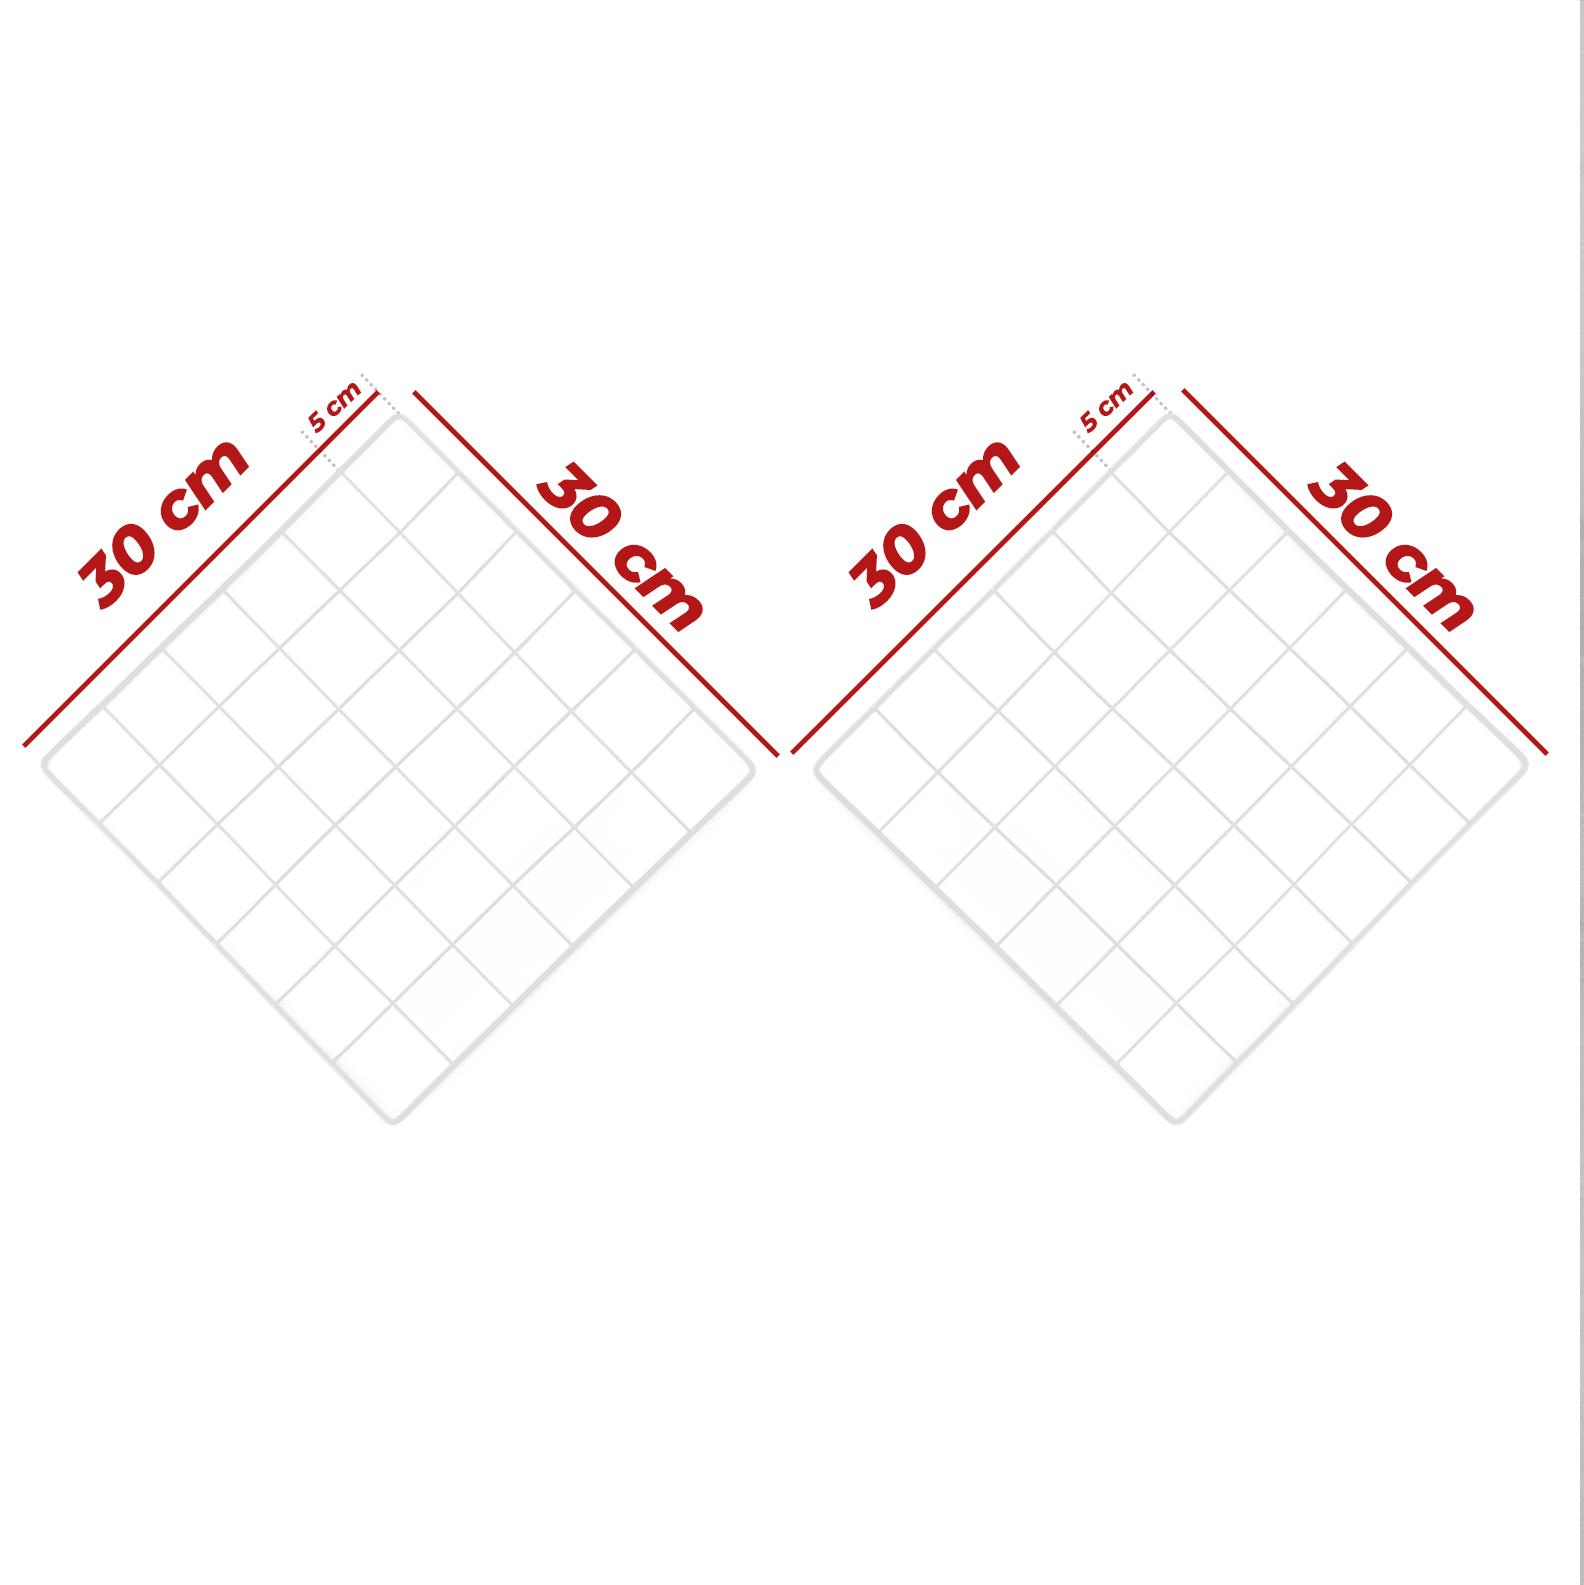 Kit Tela Mural Memory Board 30x30cm - 2 Unidades